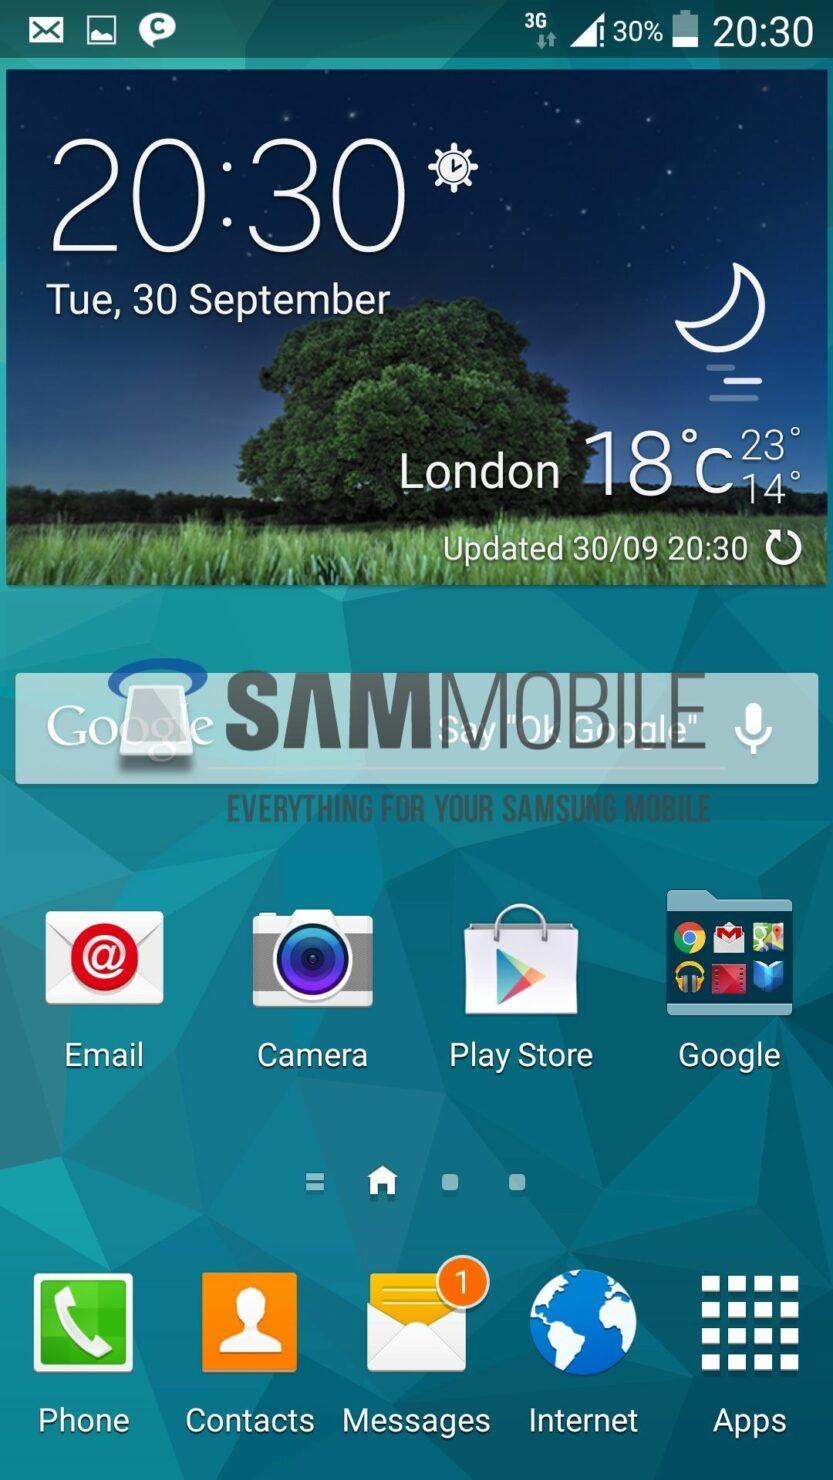 samsung-galaxy-s5-running-android-lollipop-2